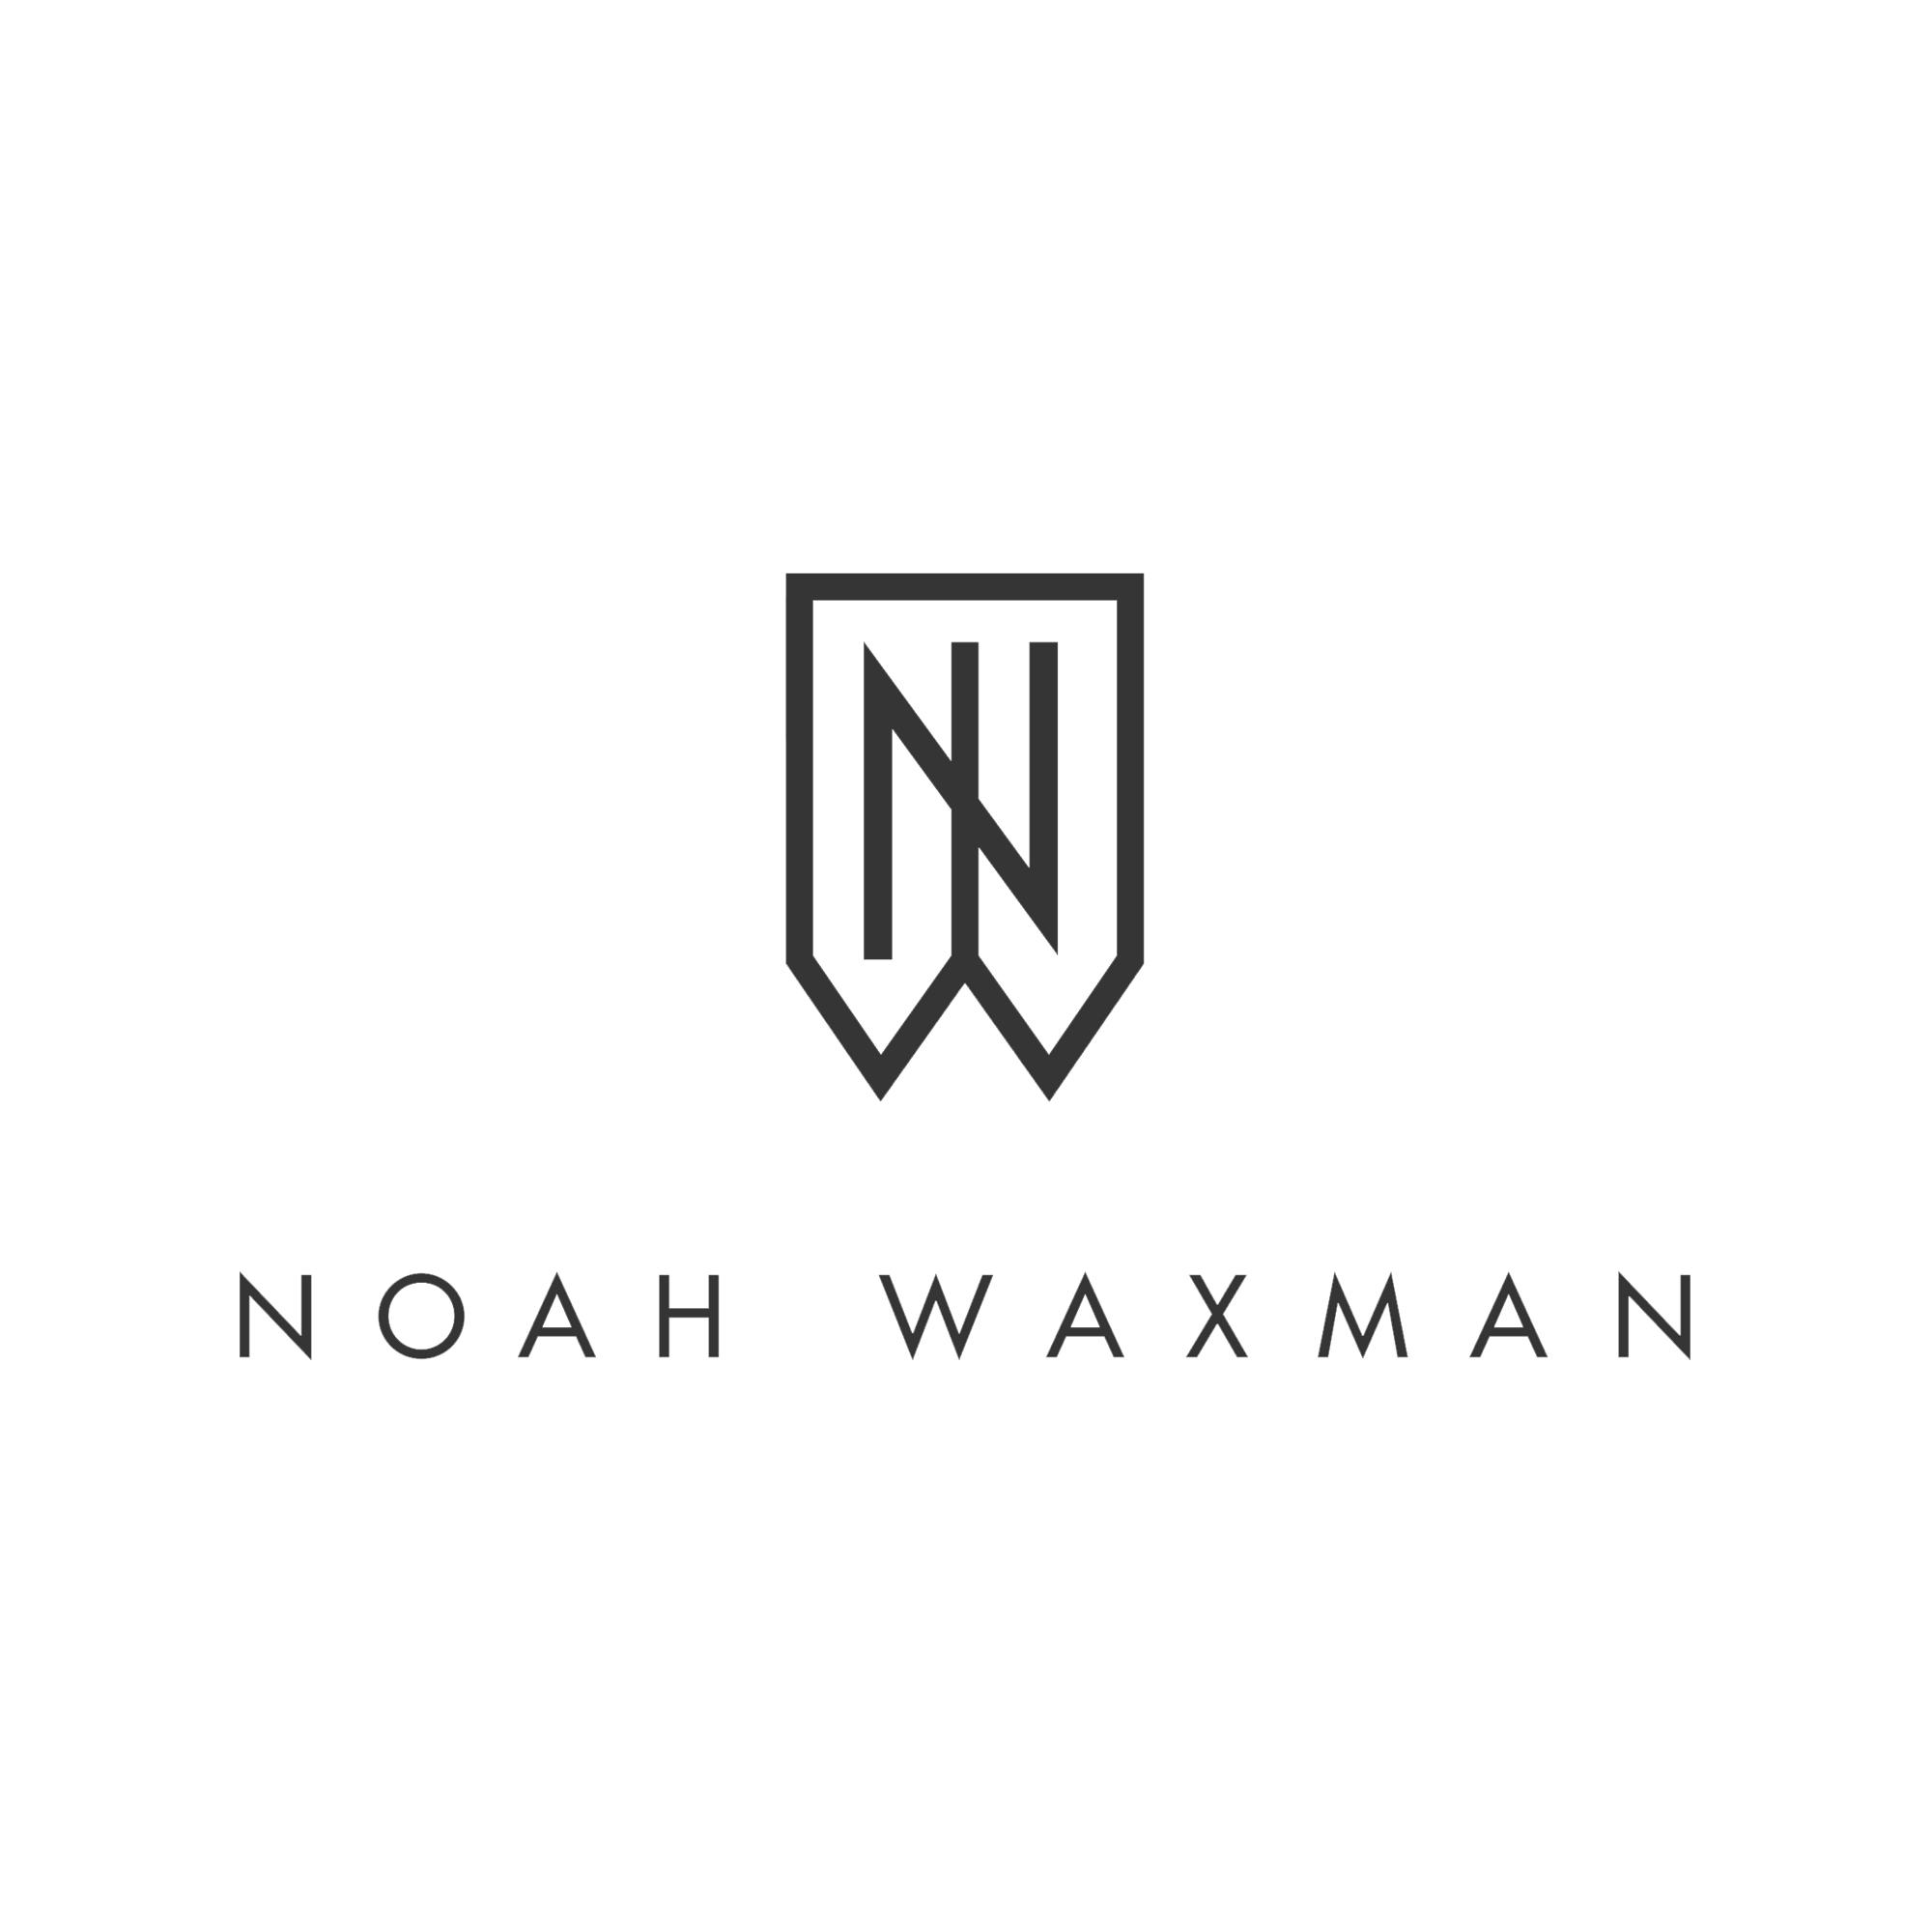 2_Noah Waxman.jpg